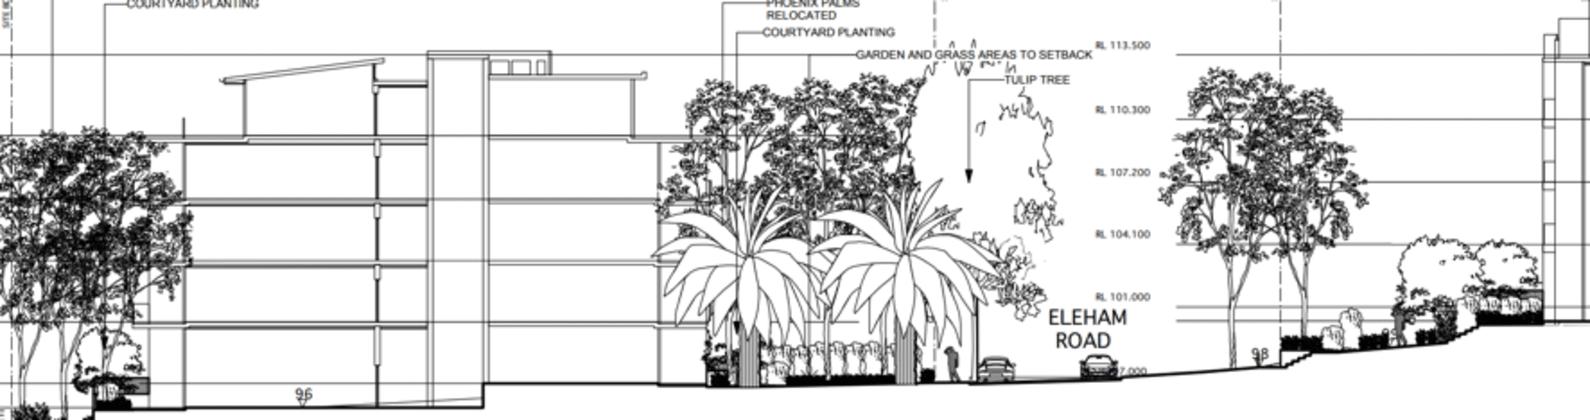 2-8 Eleham Road, Lindfield. Planning Image: PD Mayoh Architect